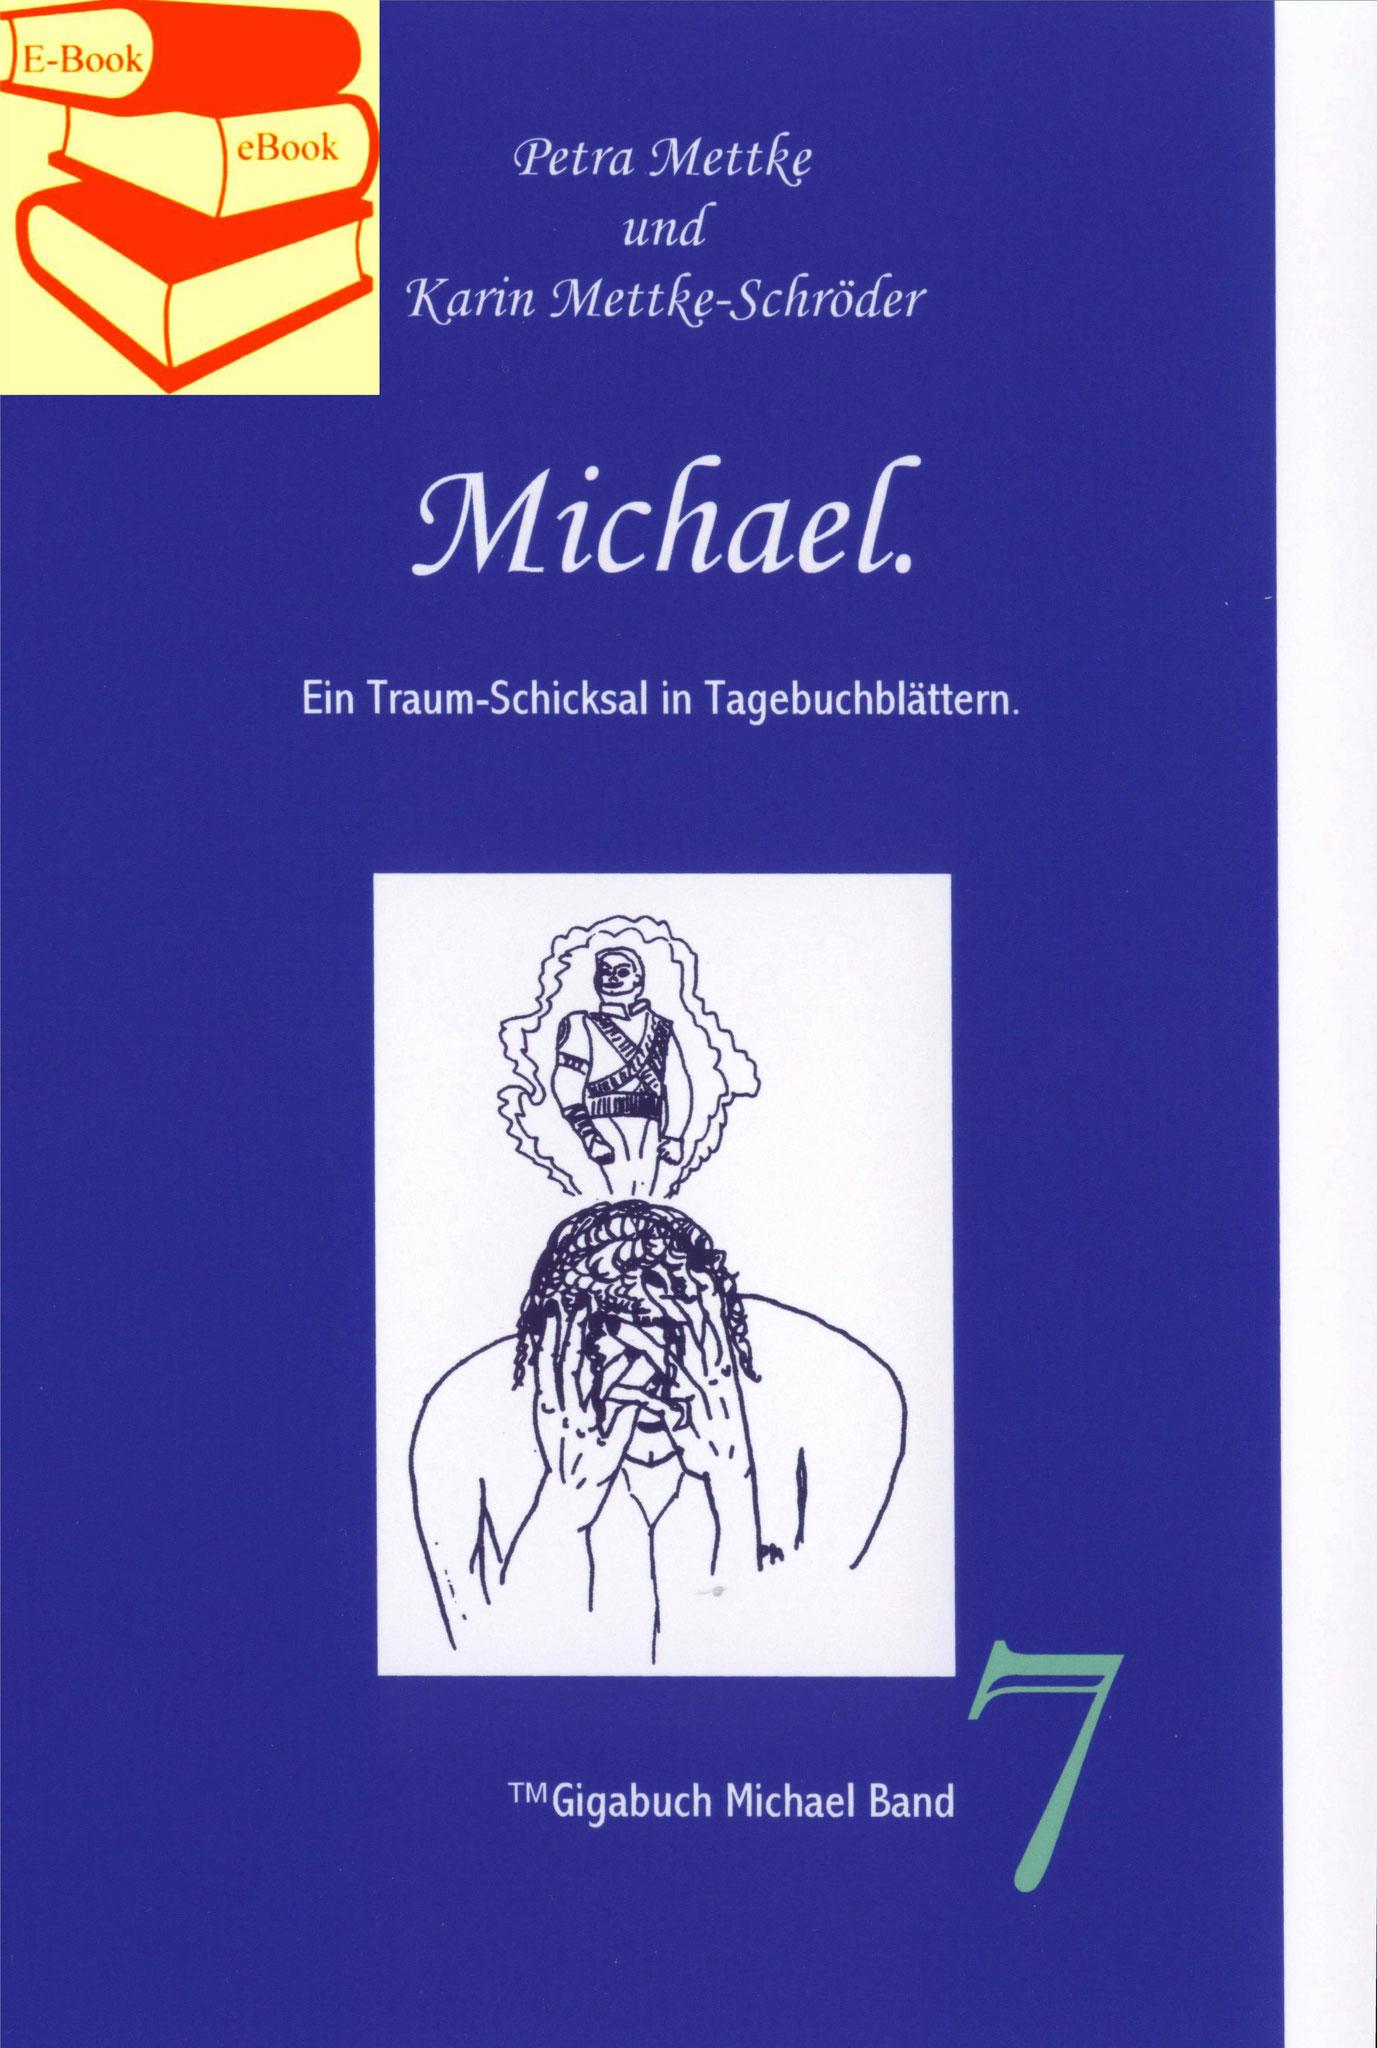 Petra Mettke, Karin Mettke-Schröder/™Gigabuch Michael 07/eBook/2014/ISBN 9783735764126